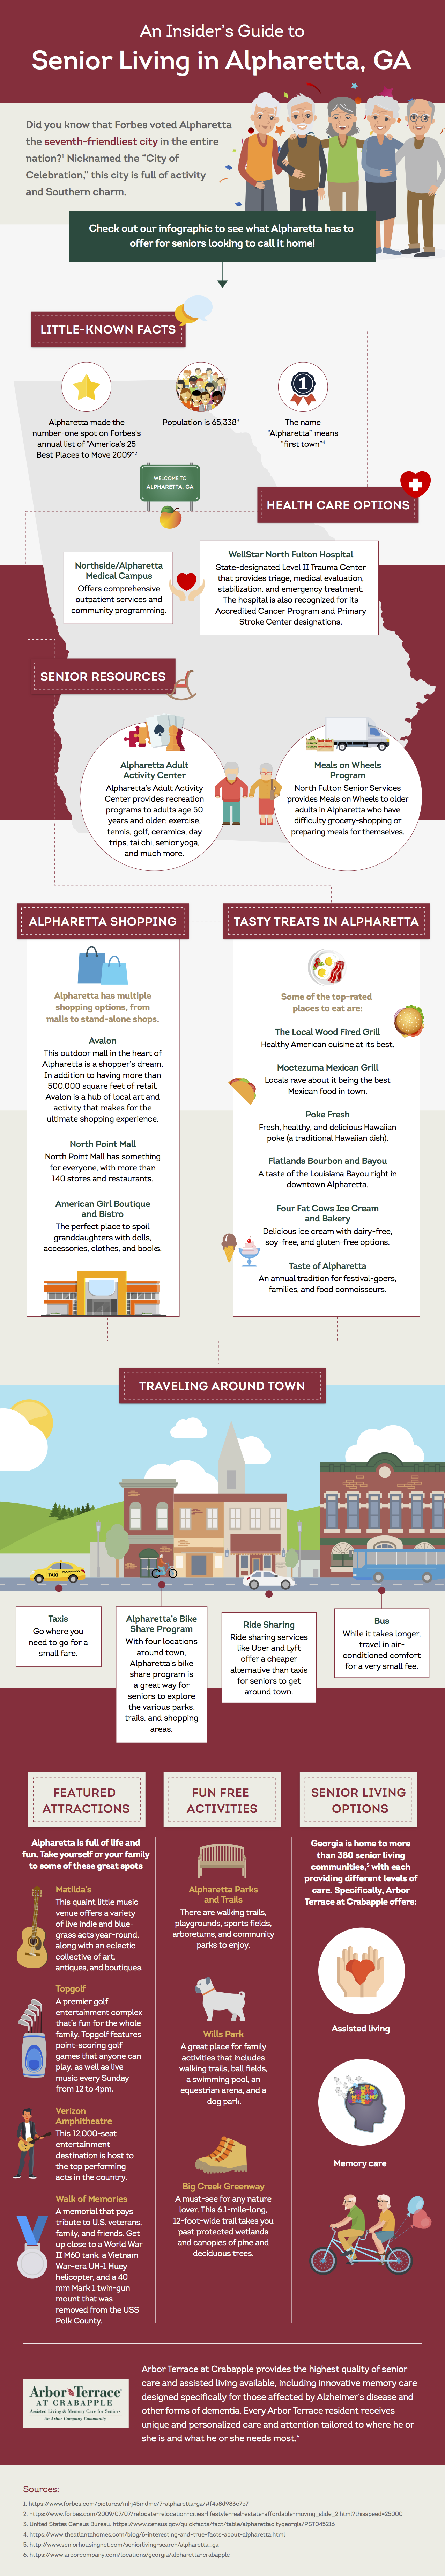 Charming [Infographic] An Insideru0027s Guide To Senior Living In Alpharetta, GA